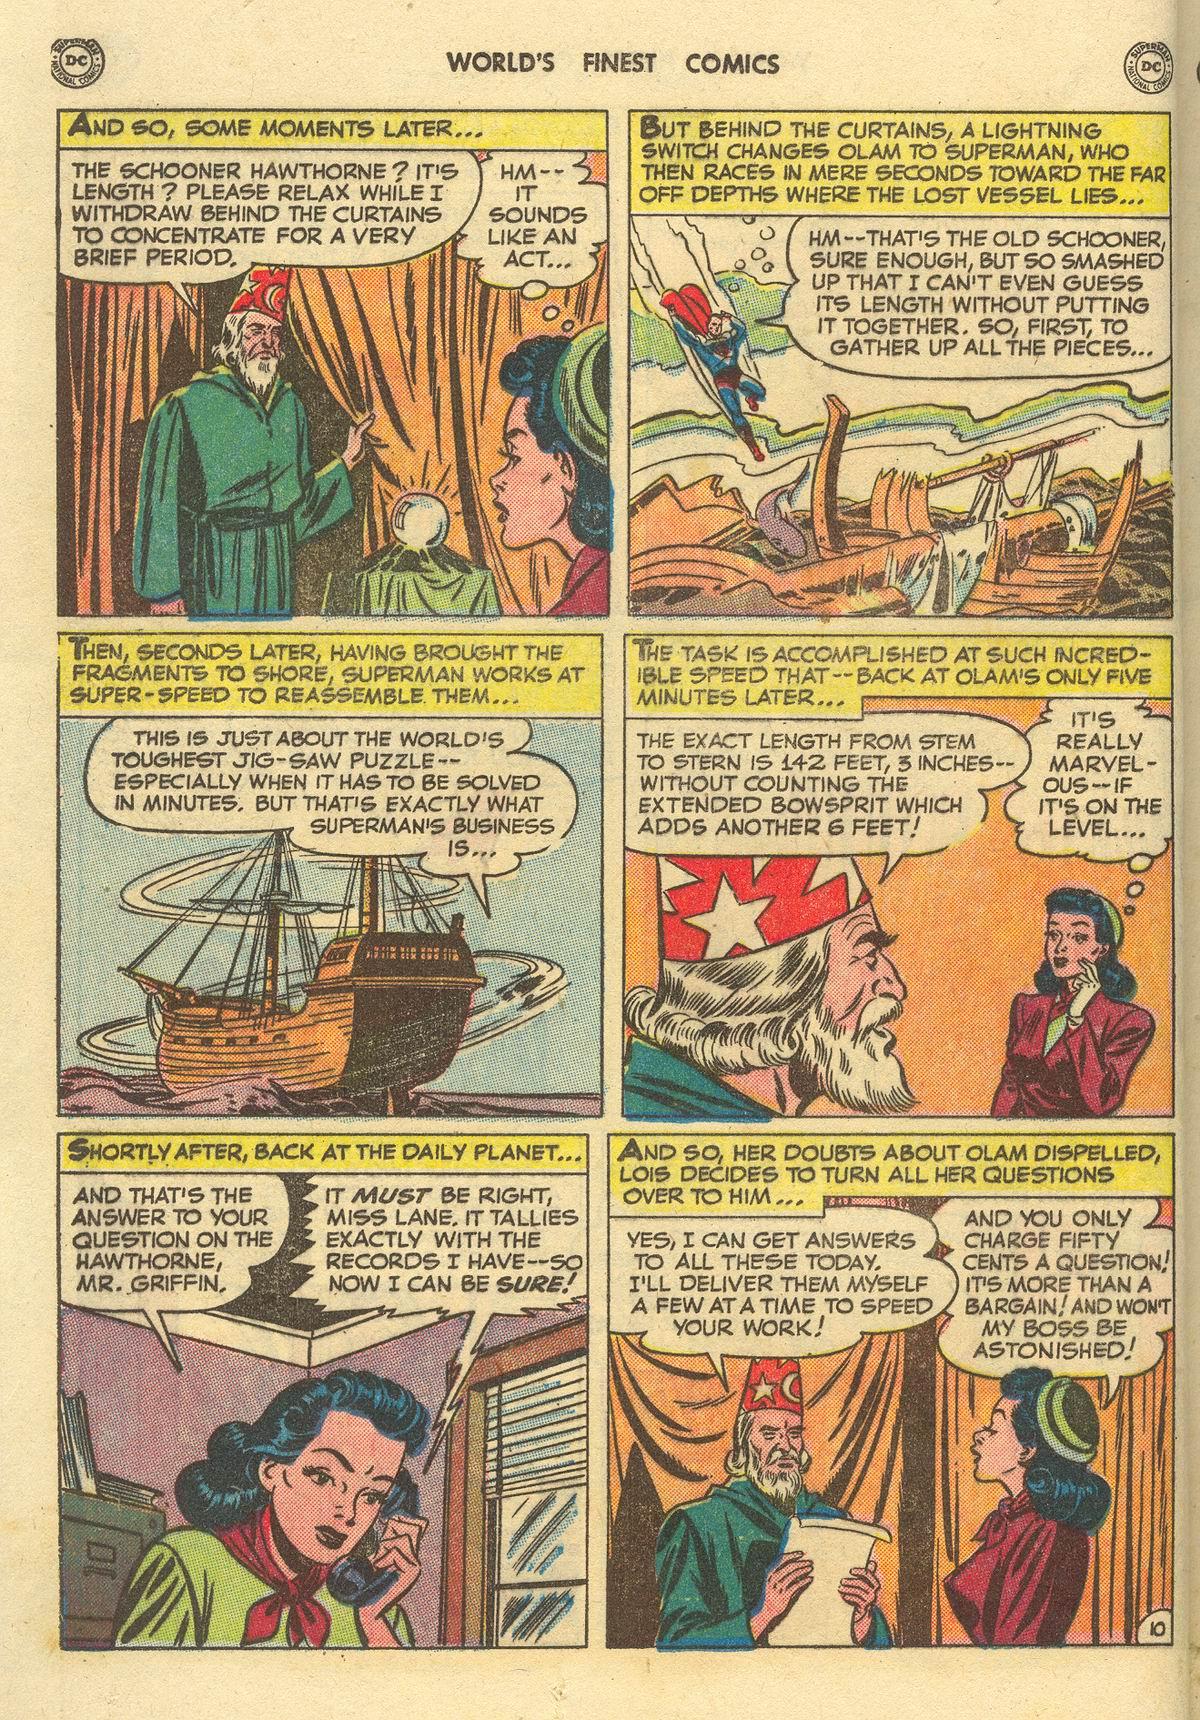 Read online World's Finest Comics comic -  Issue #51 - 12